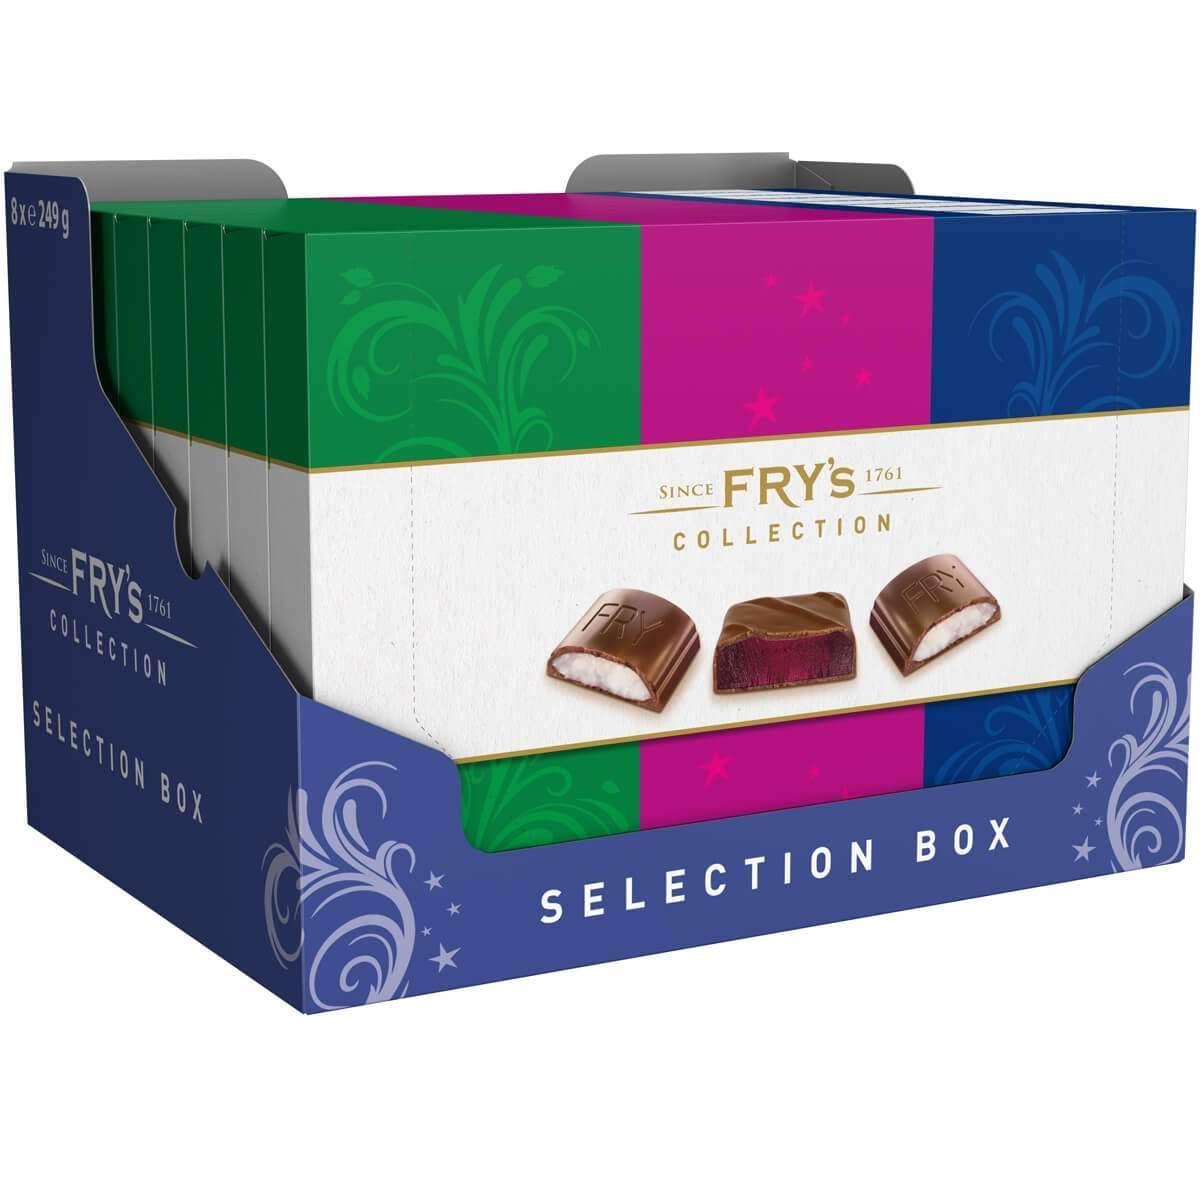 Fry's Selection Box 249g Box of 8